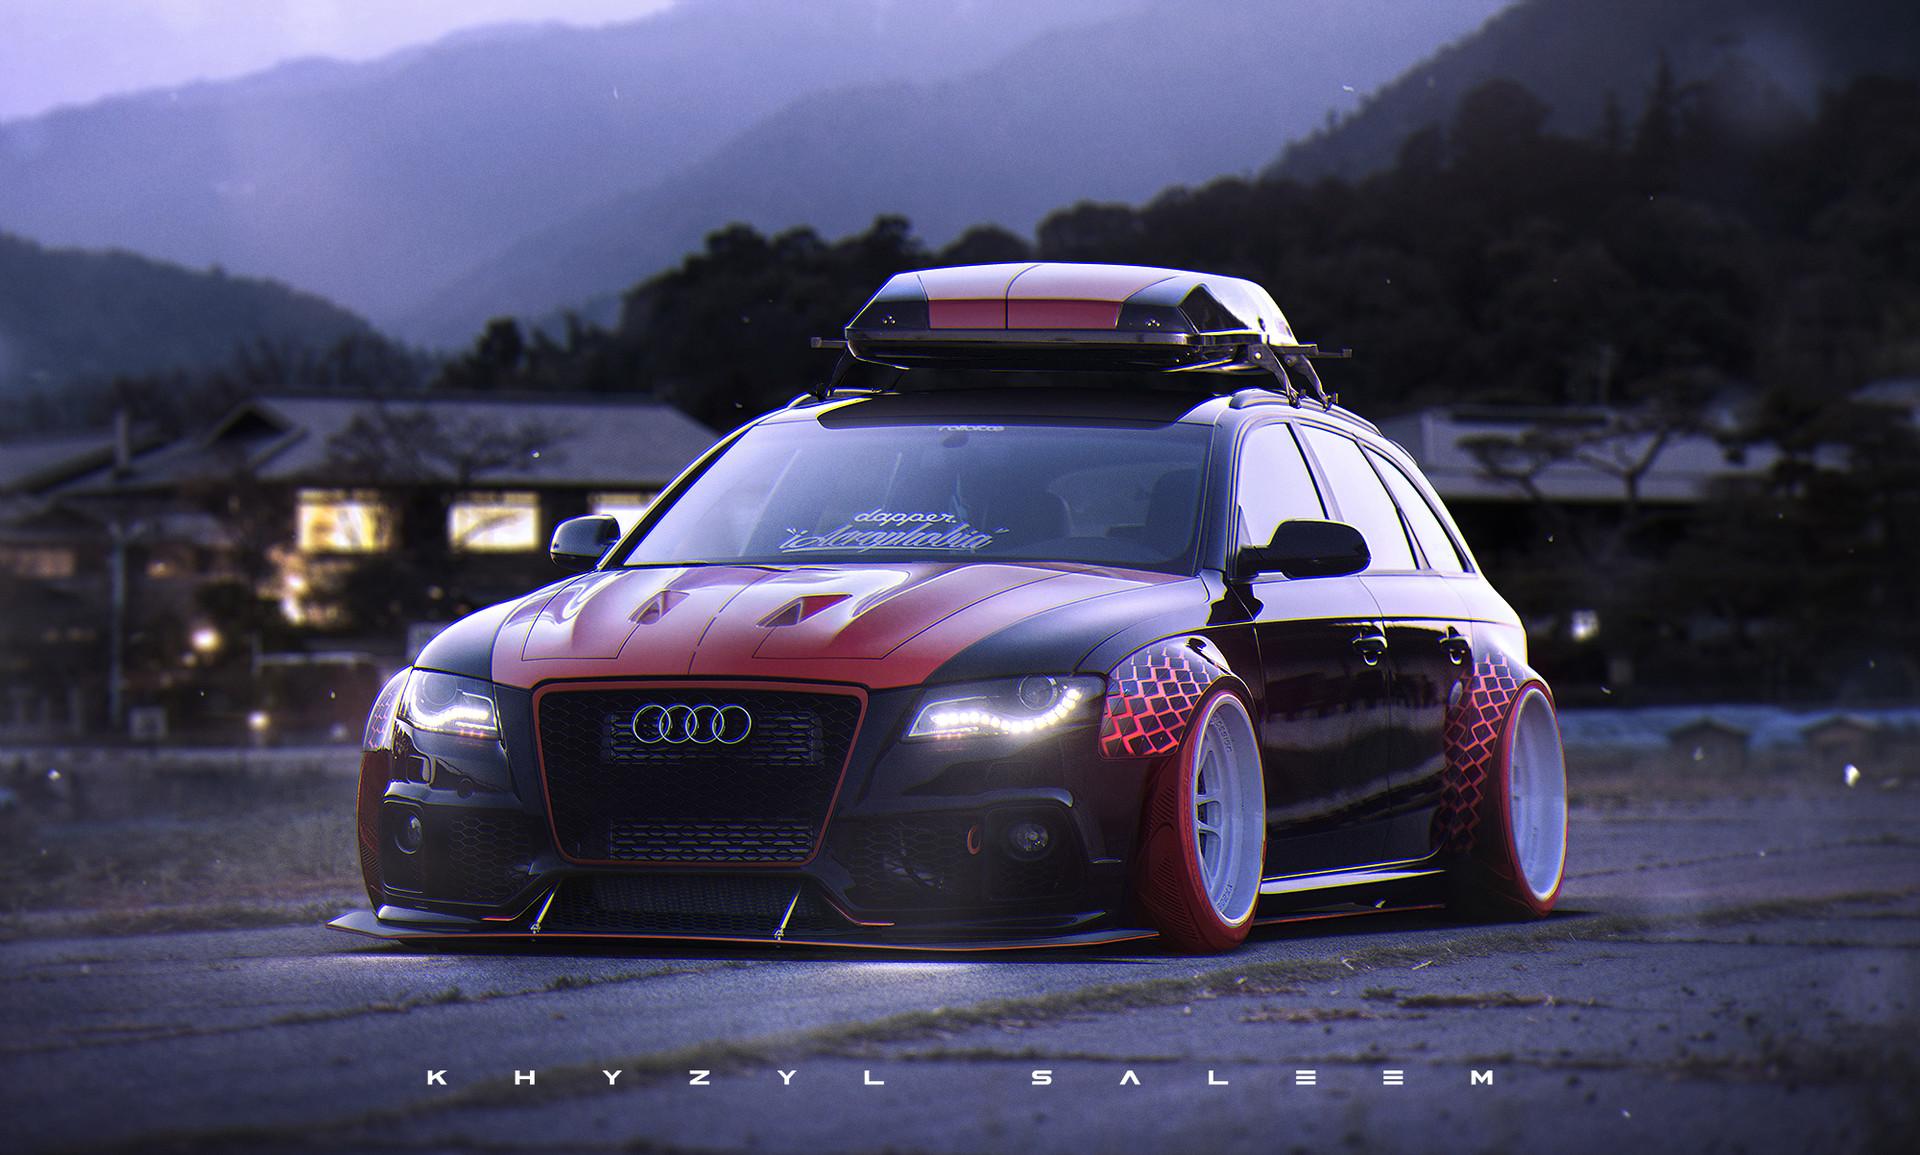 Audi Rs3 Wallpaper Hd Artstation Bmw Audi Mashup Khyzyl Saleem